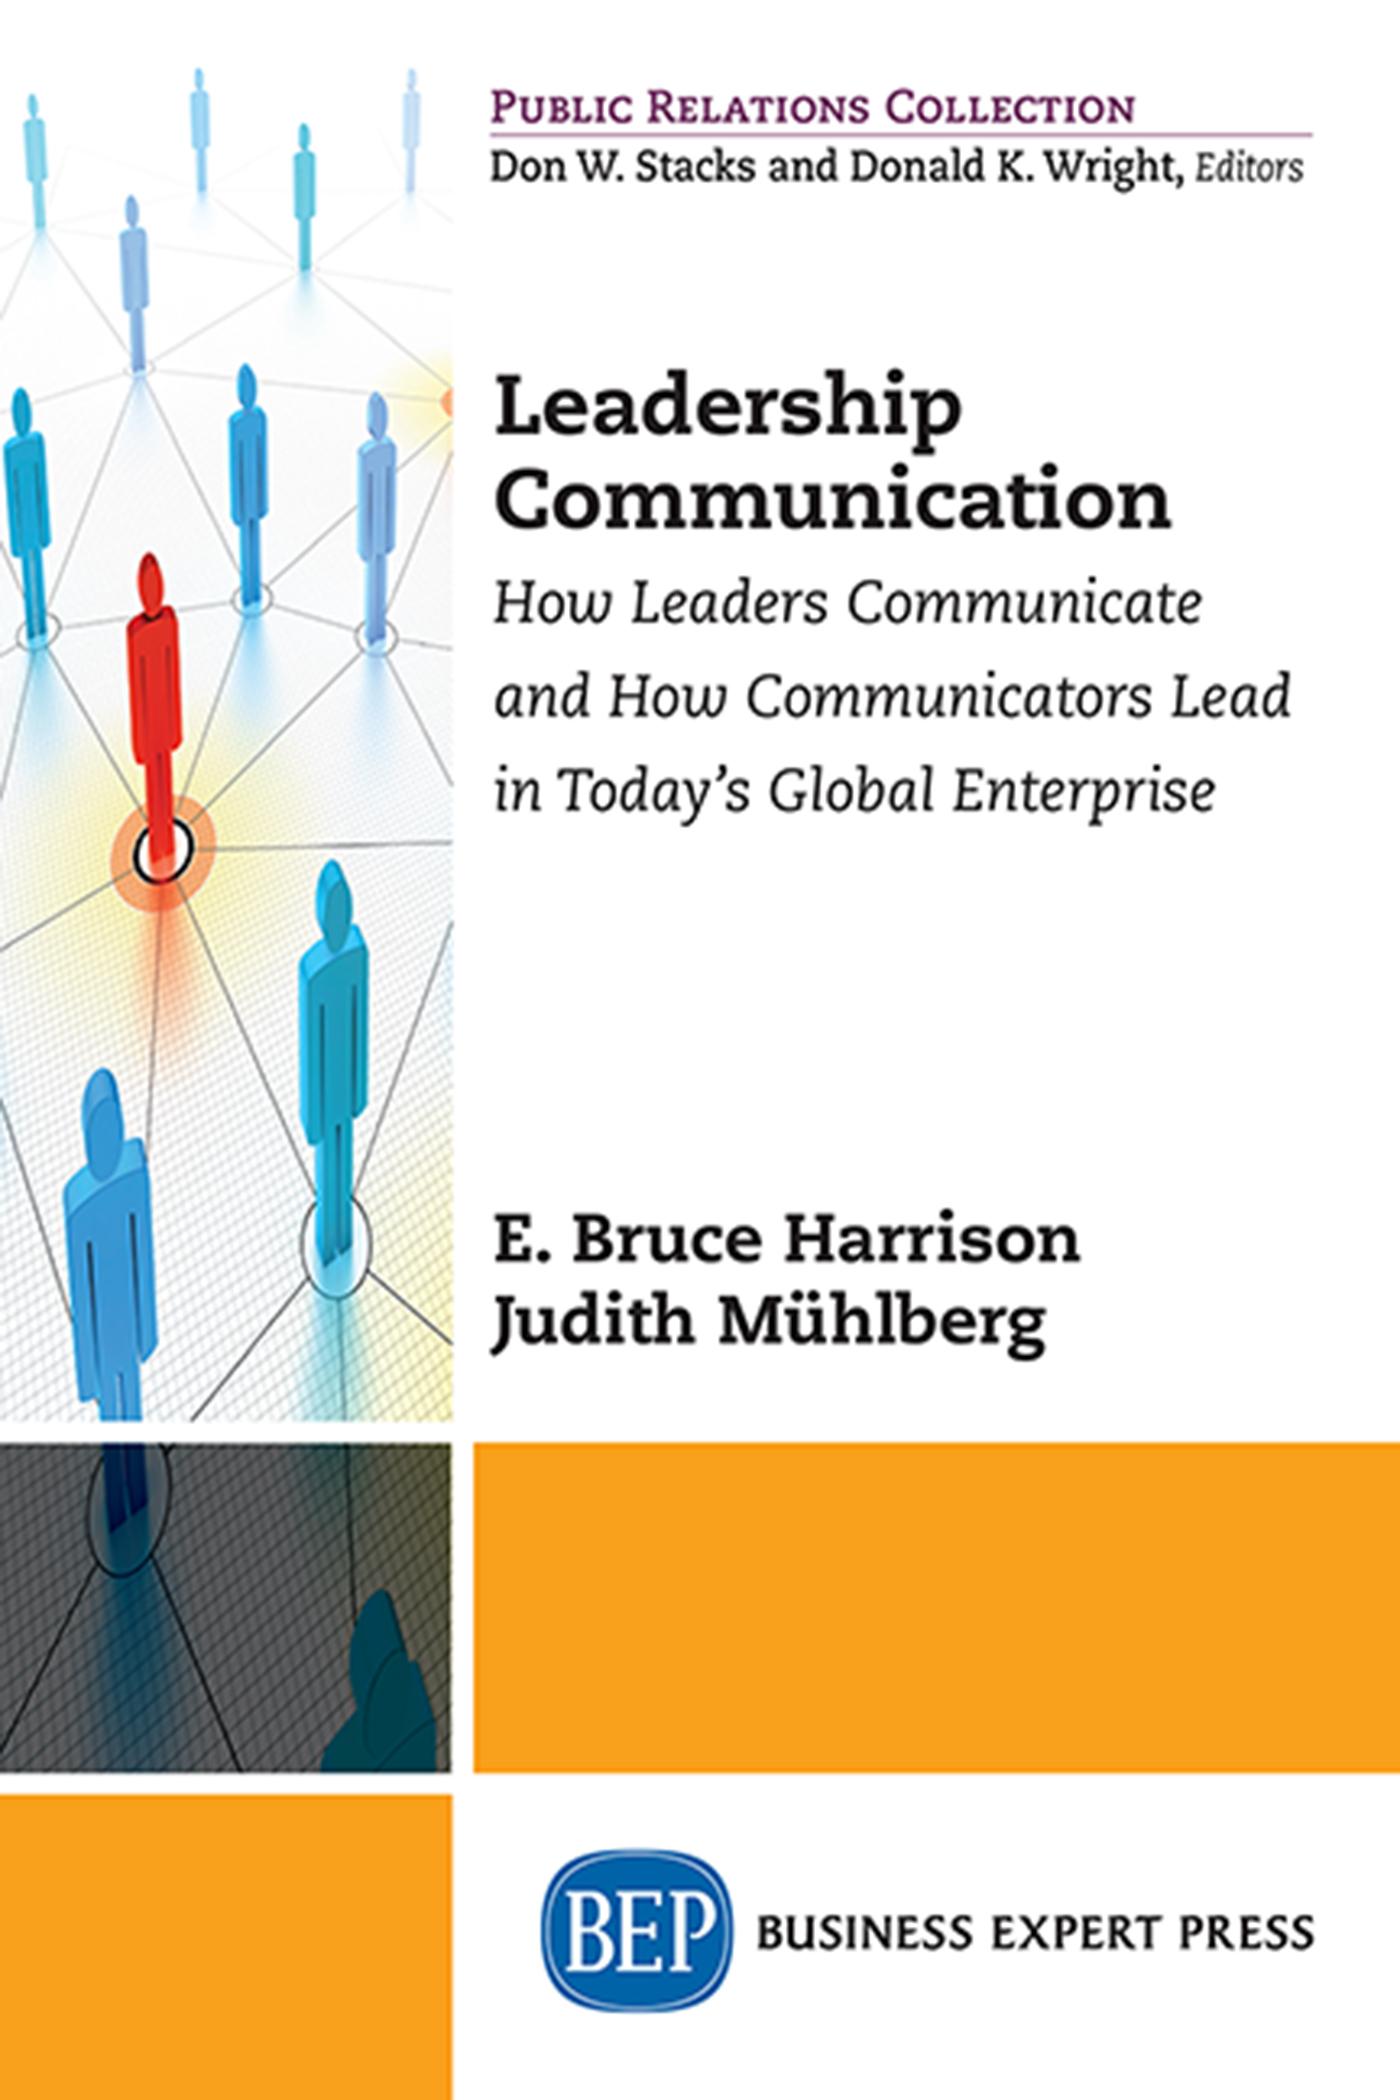 Download Ebook Leadership Communication by E. Bruce Harrison Pdf